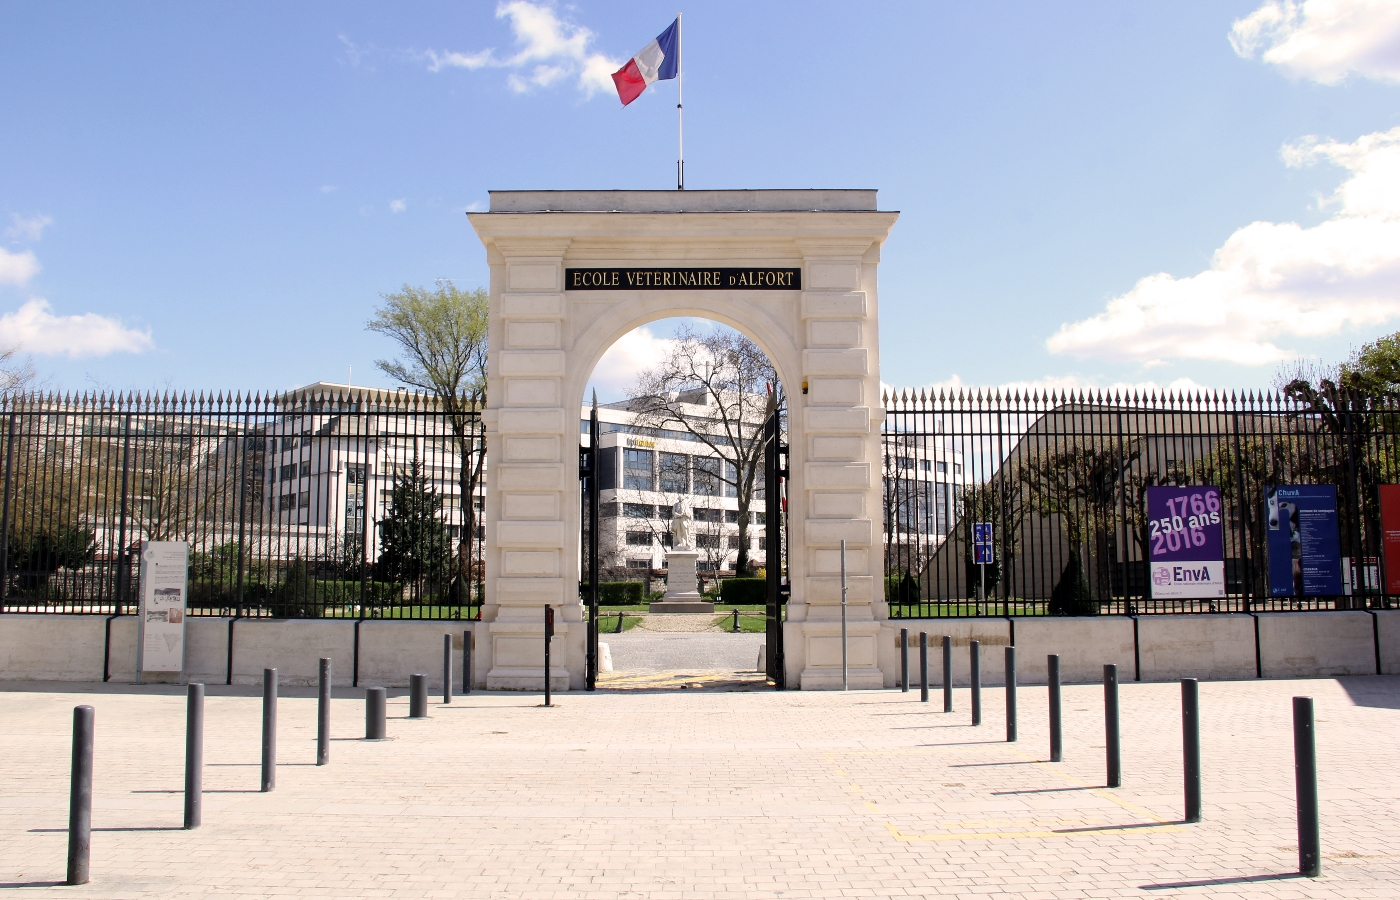 Enva portail agreenium for Adresse ecole veterinaire maison alfort